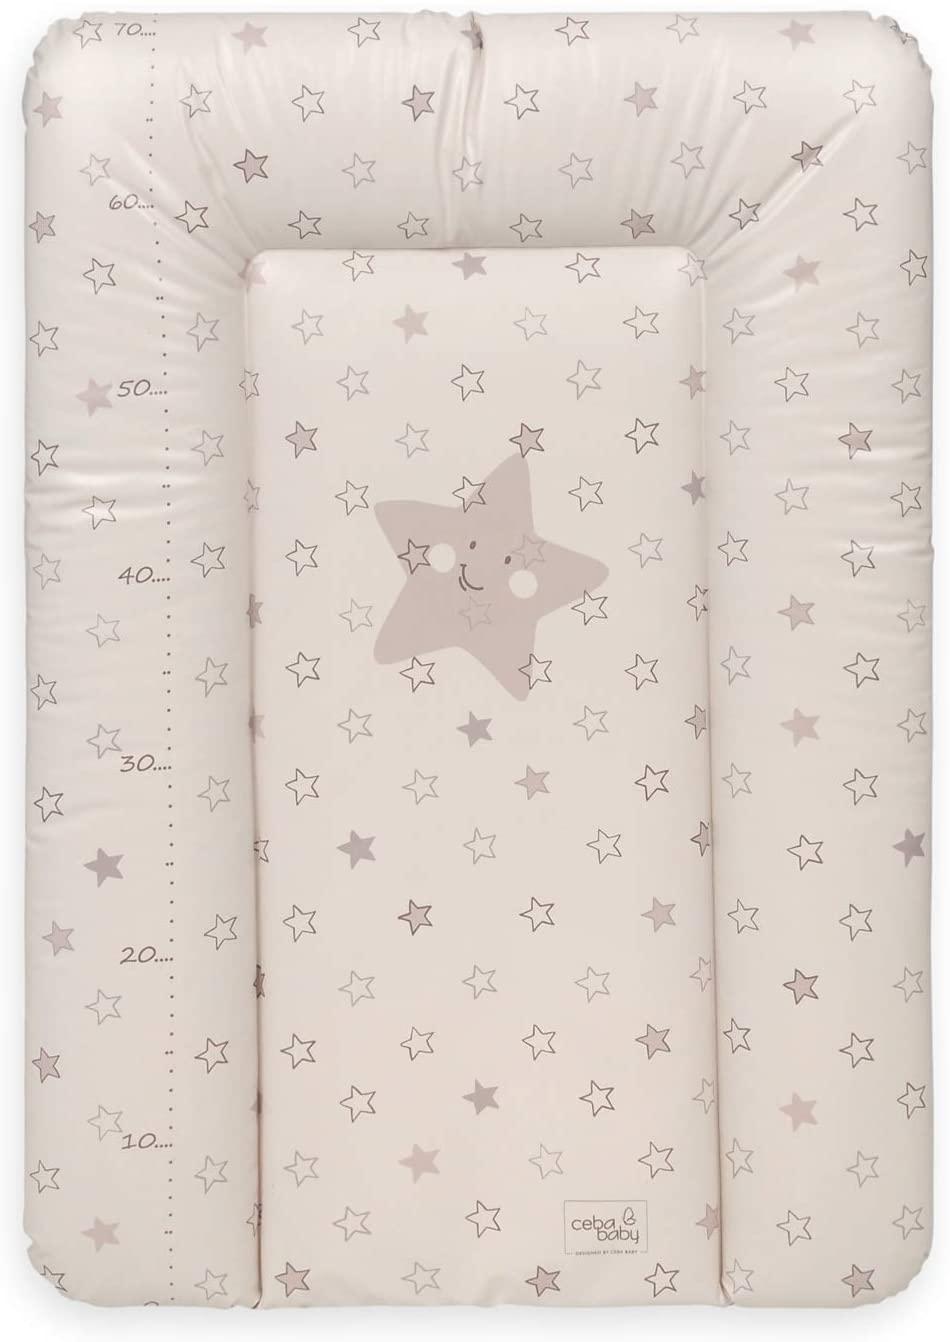 Měkký MAT (50x70) STARS BEIGE